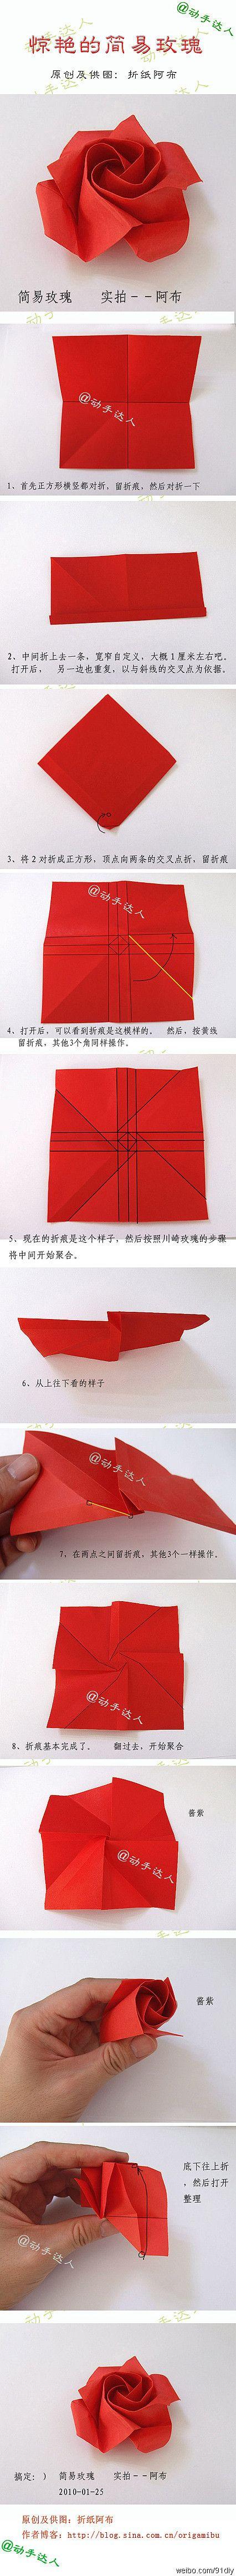 оригами сердца схема